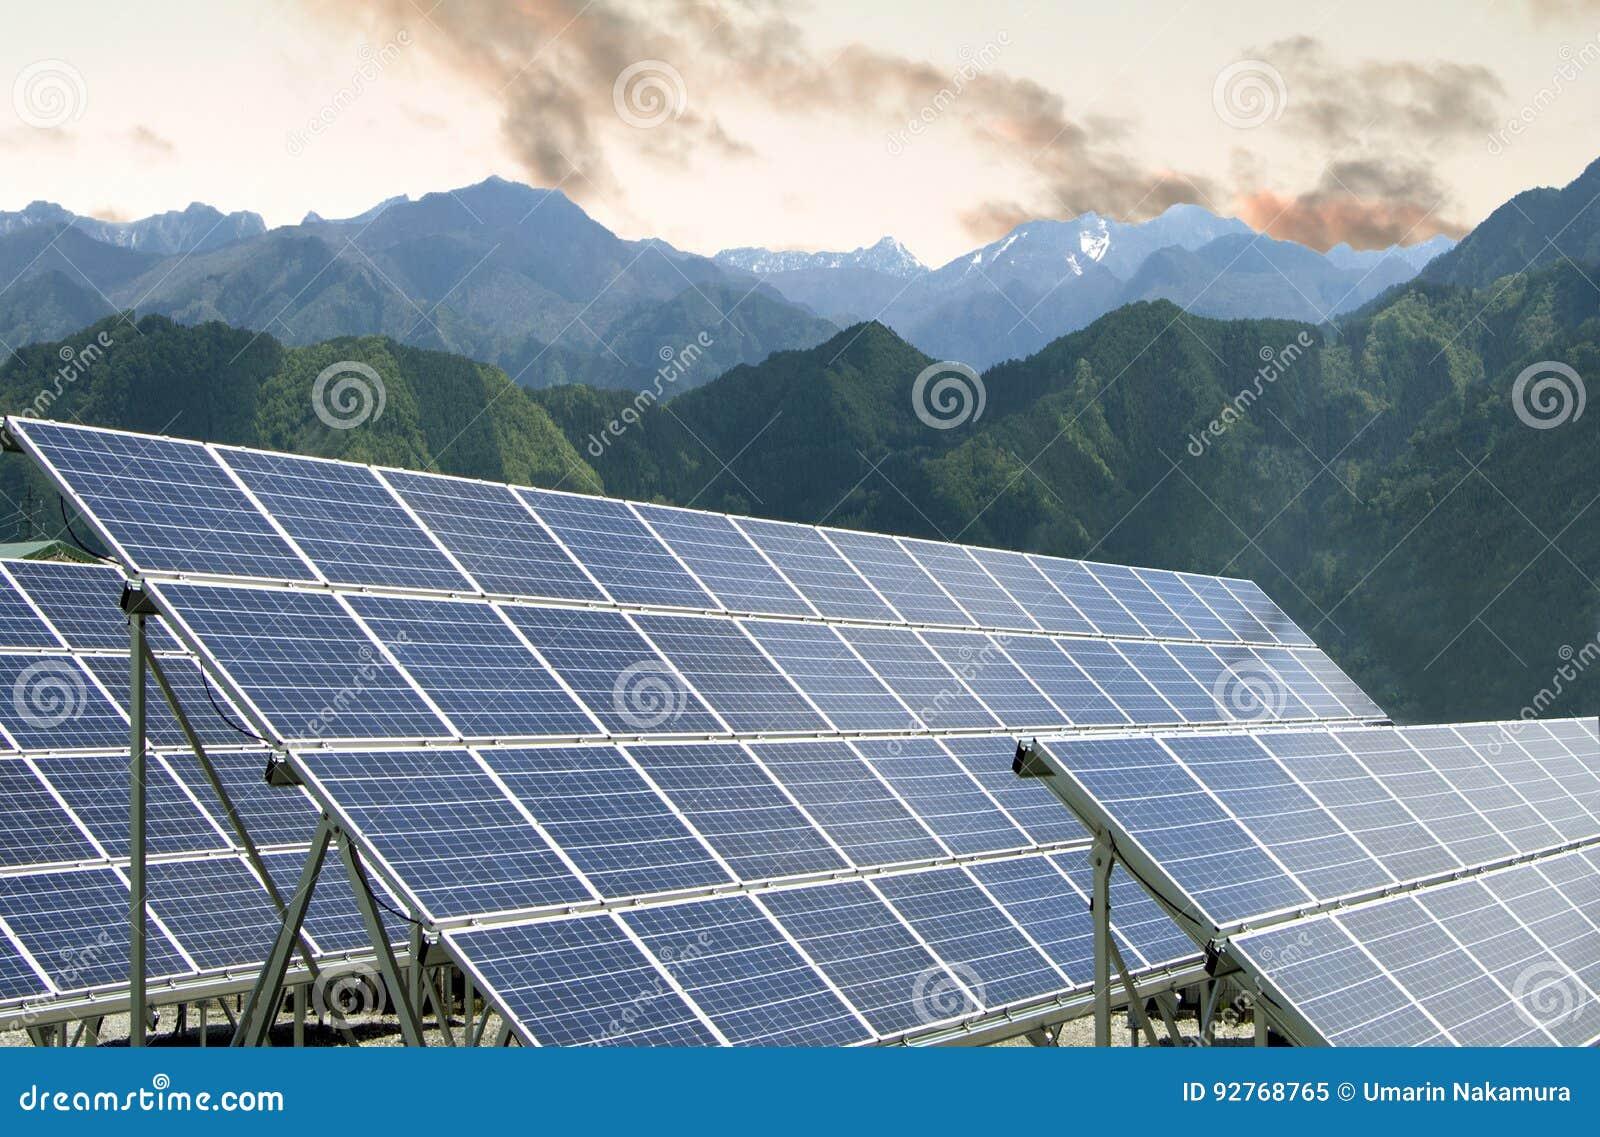 Solarenergie-Gremien